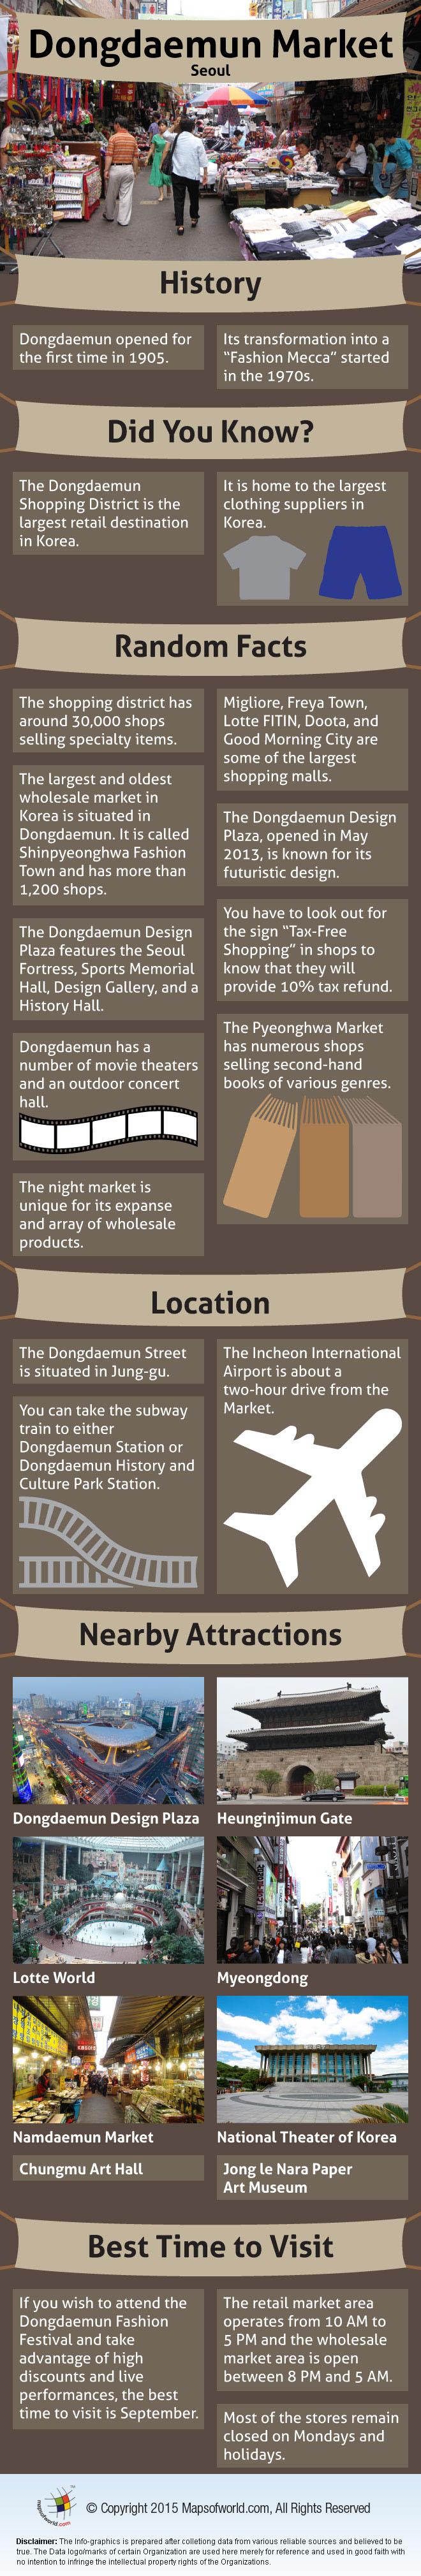 Dongdaemun Market Infographic